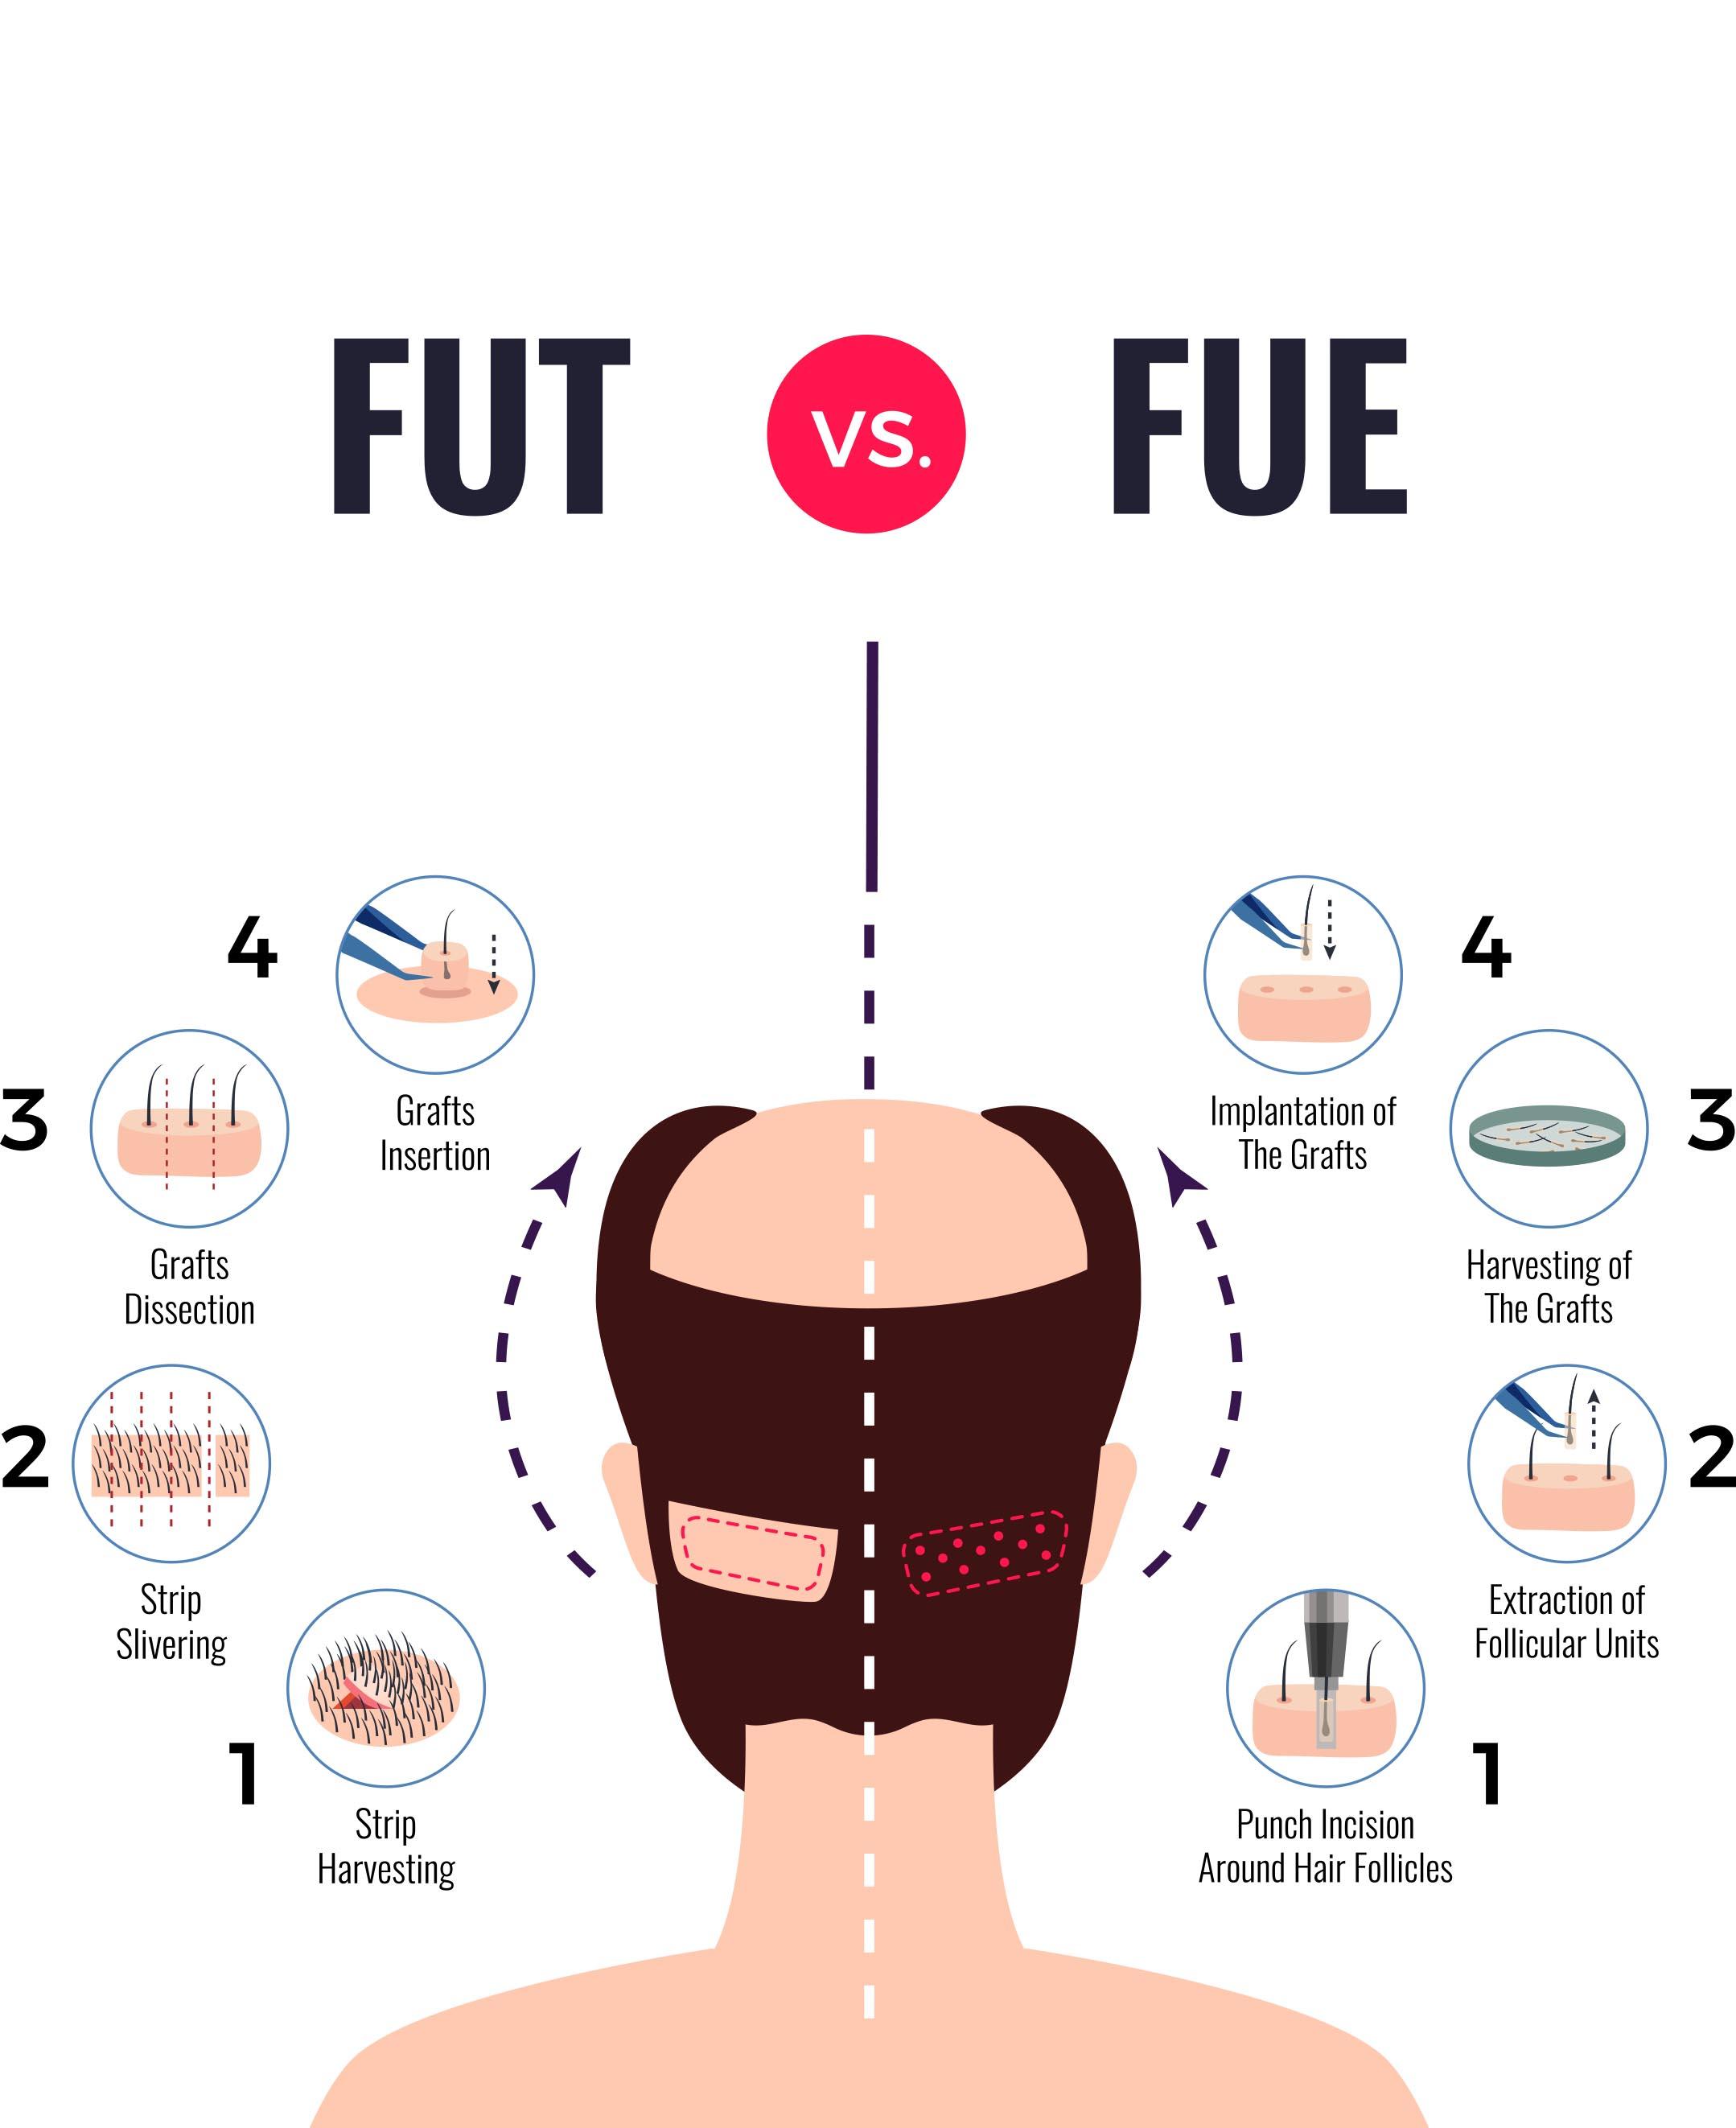 FUE Hair Transplant vs FUT